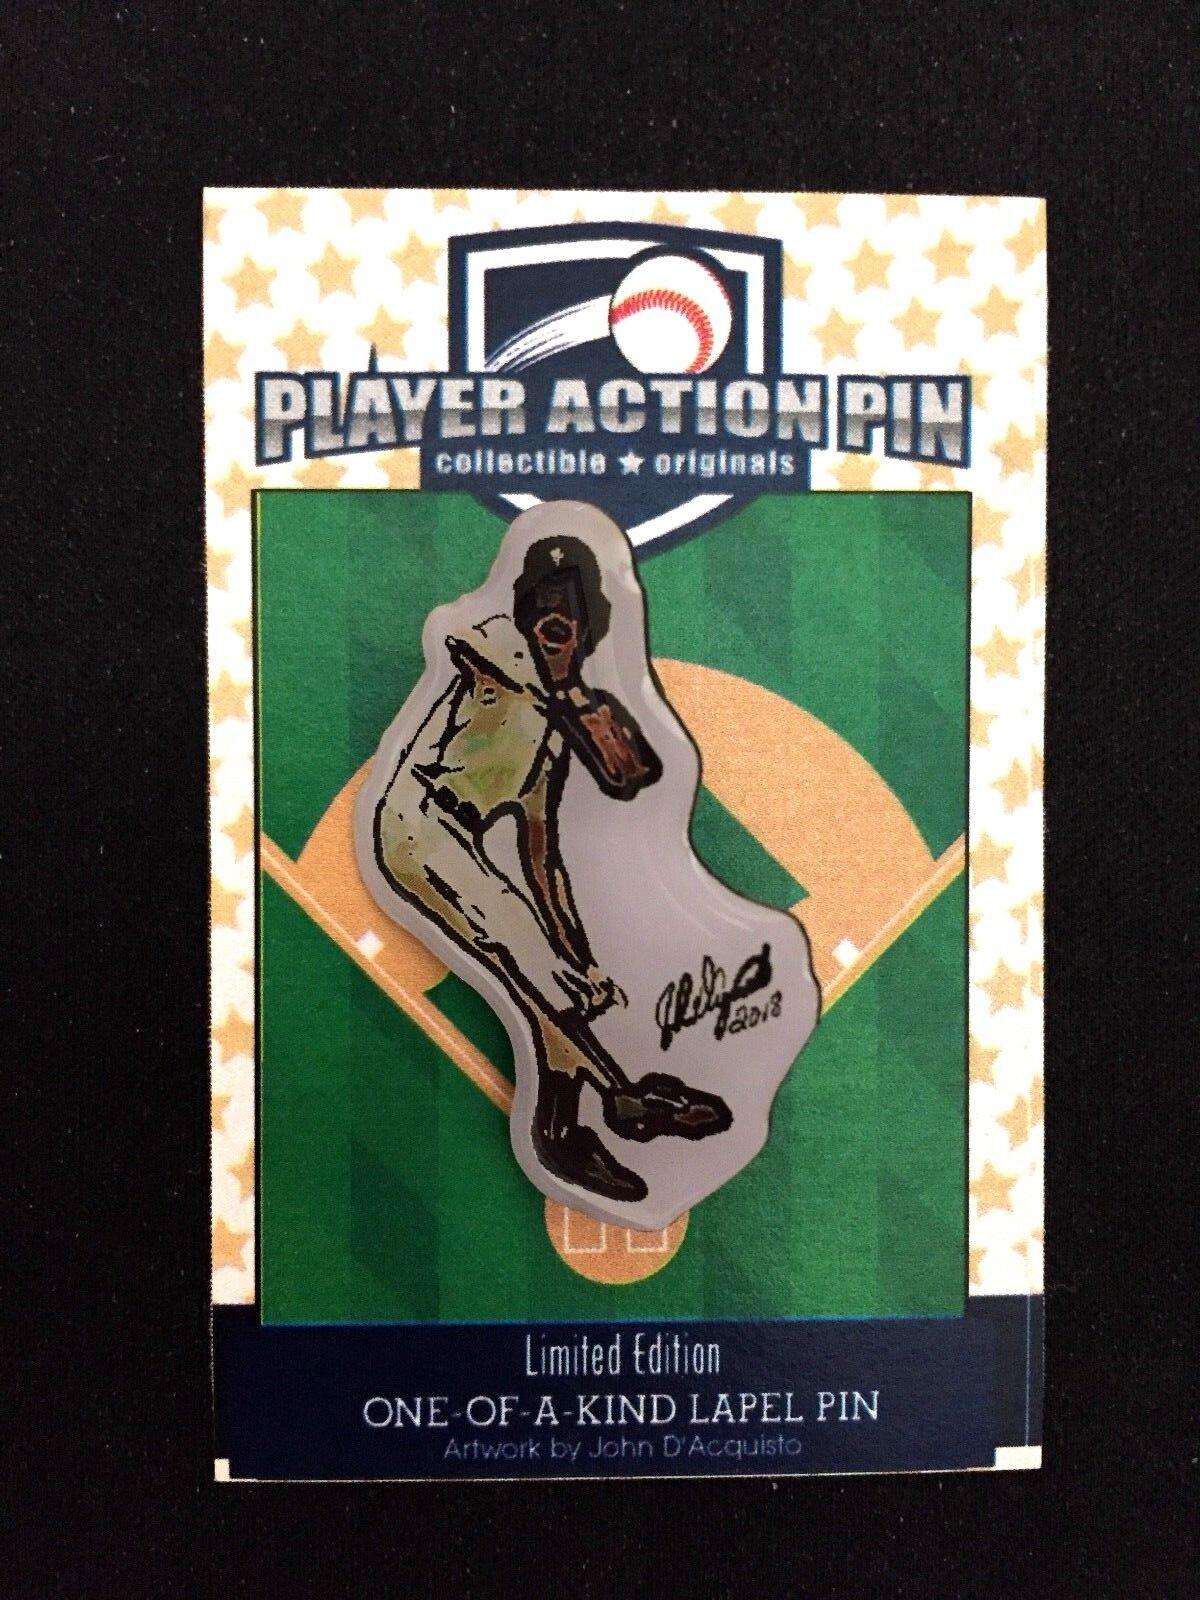 New York Yankees Ron Guidry Trikot Trikot Trikot Revers Pin-Collectible-Limited Edition-Gator c9a5c2